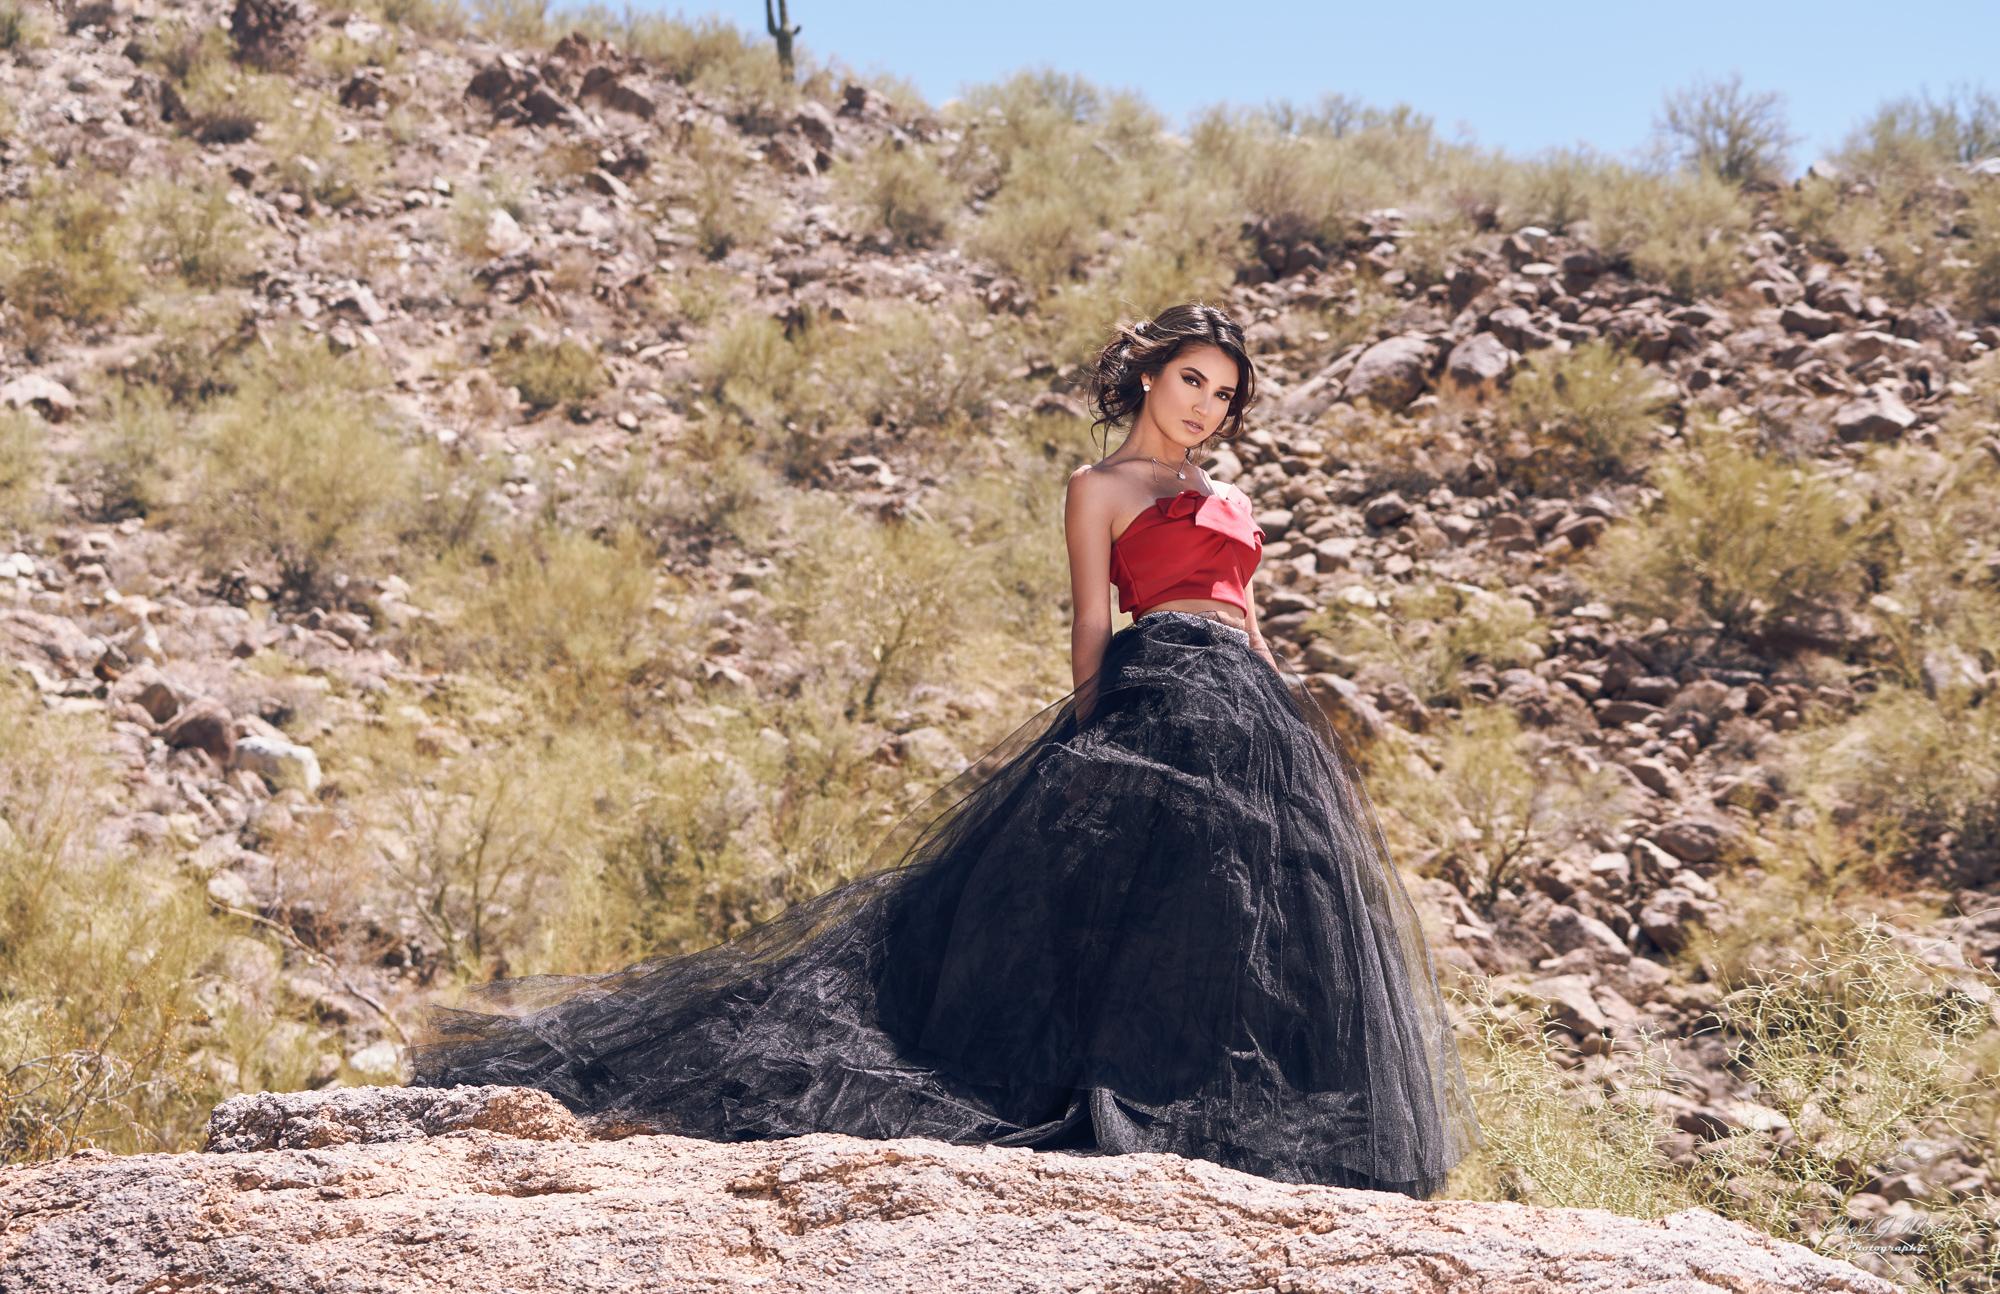 Glamour Model Zari by Mesa Arizona GlamourPhotographer Chad Weed